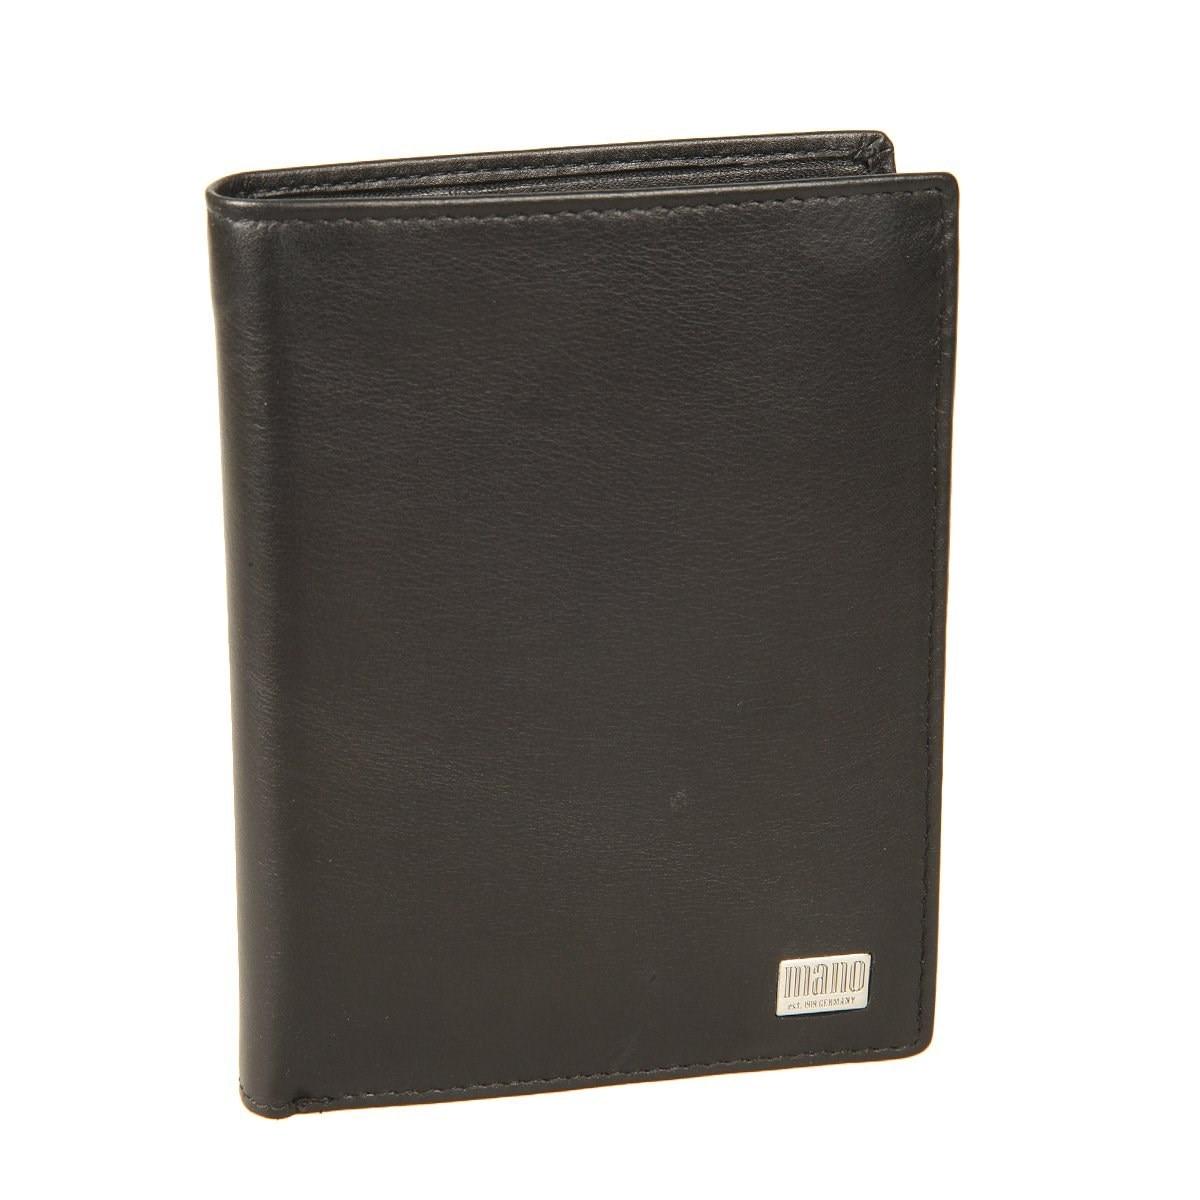 Coin Purse Mano 15806 Linea black декобокс postermarket коньяк 40 х 50 см dc 4014